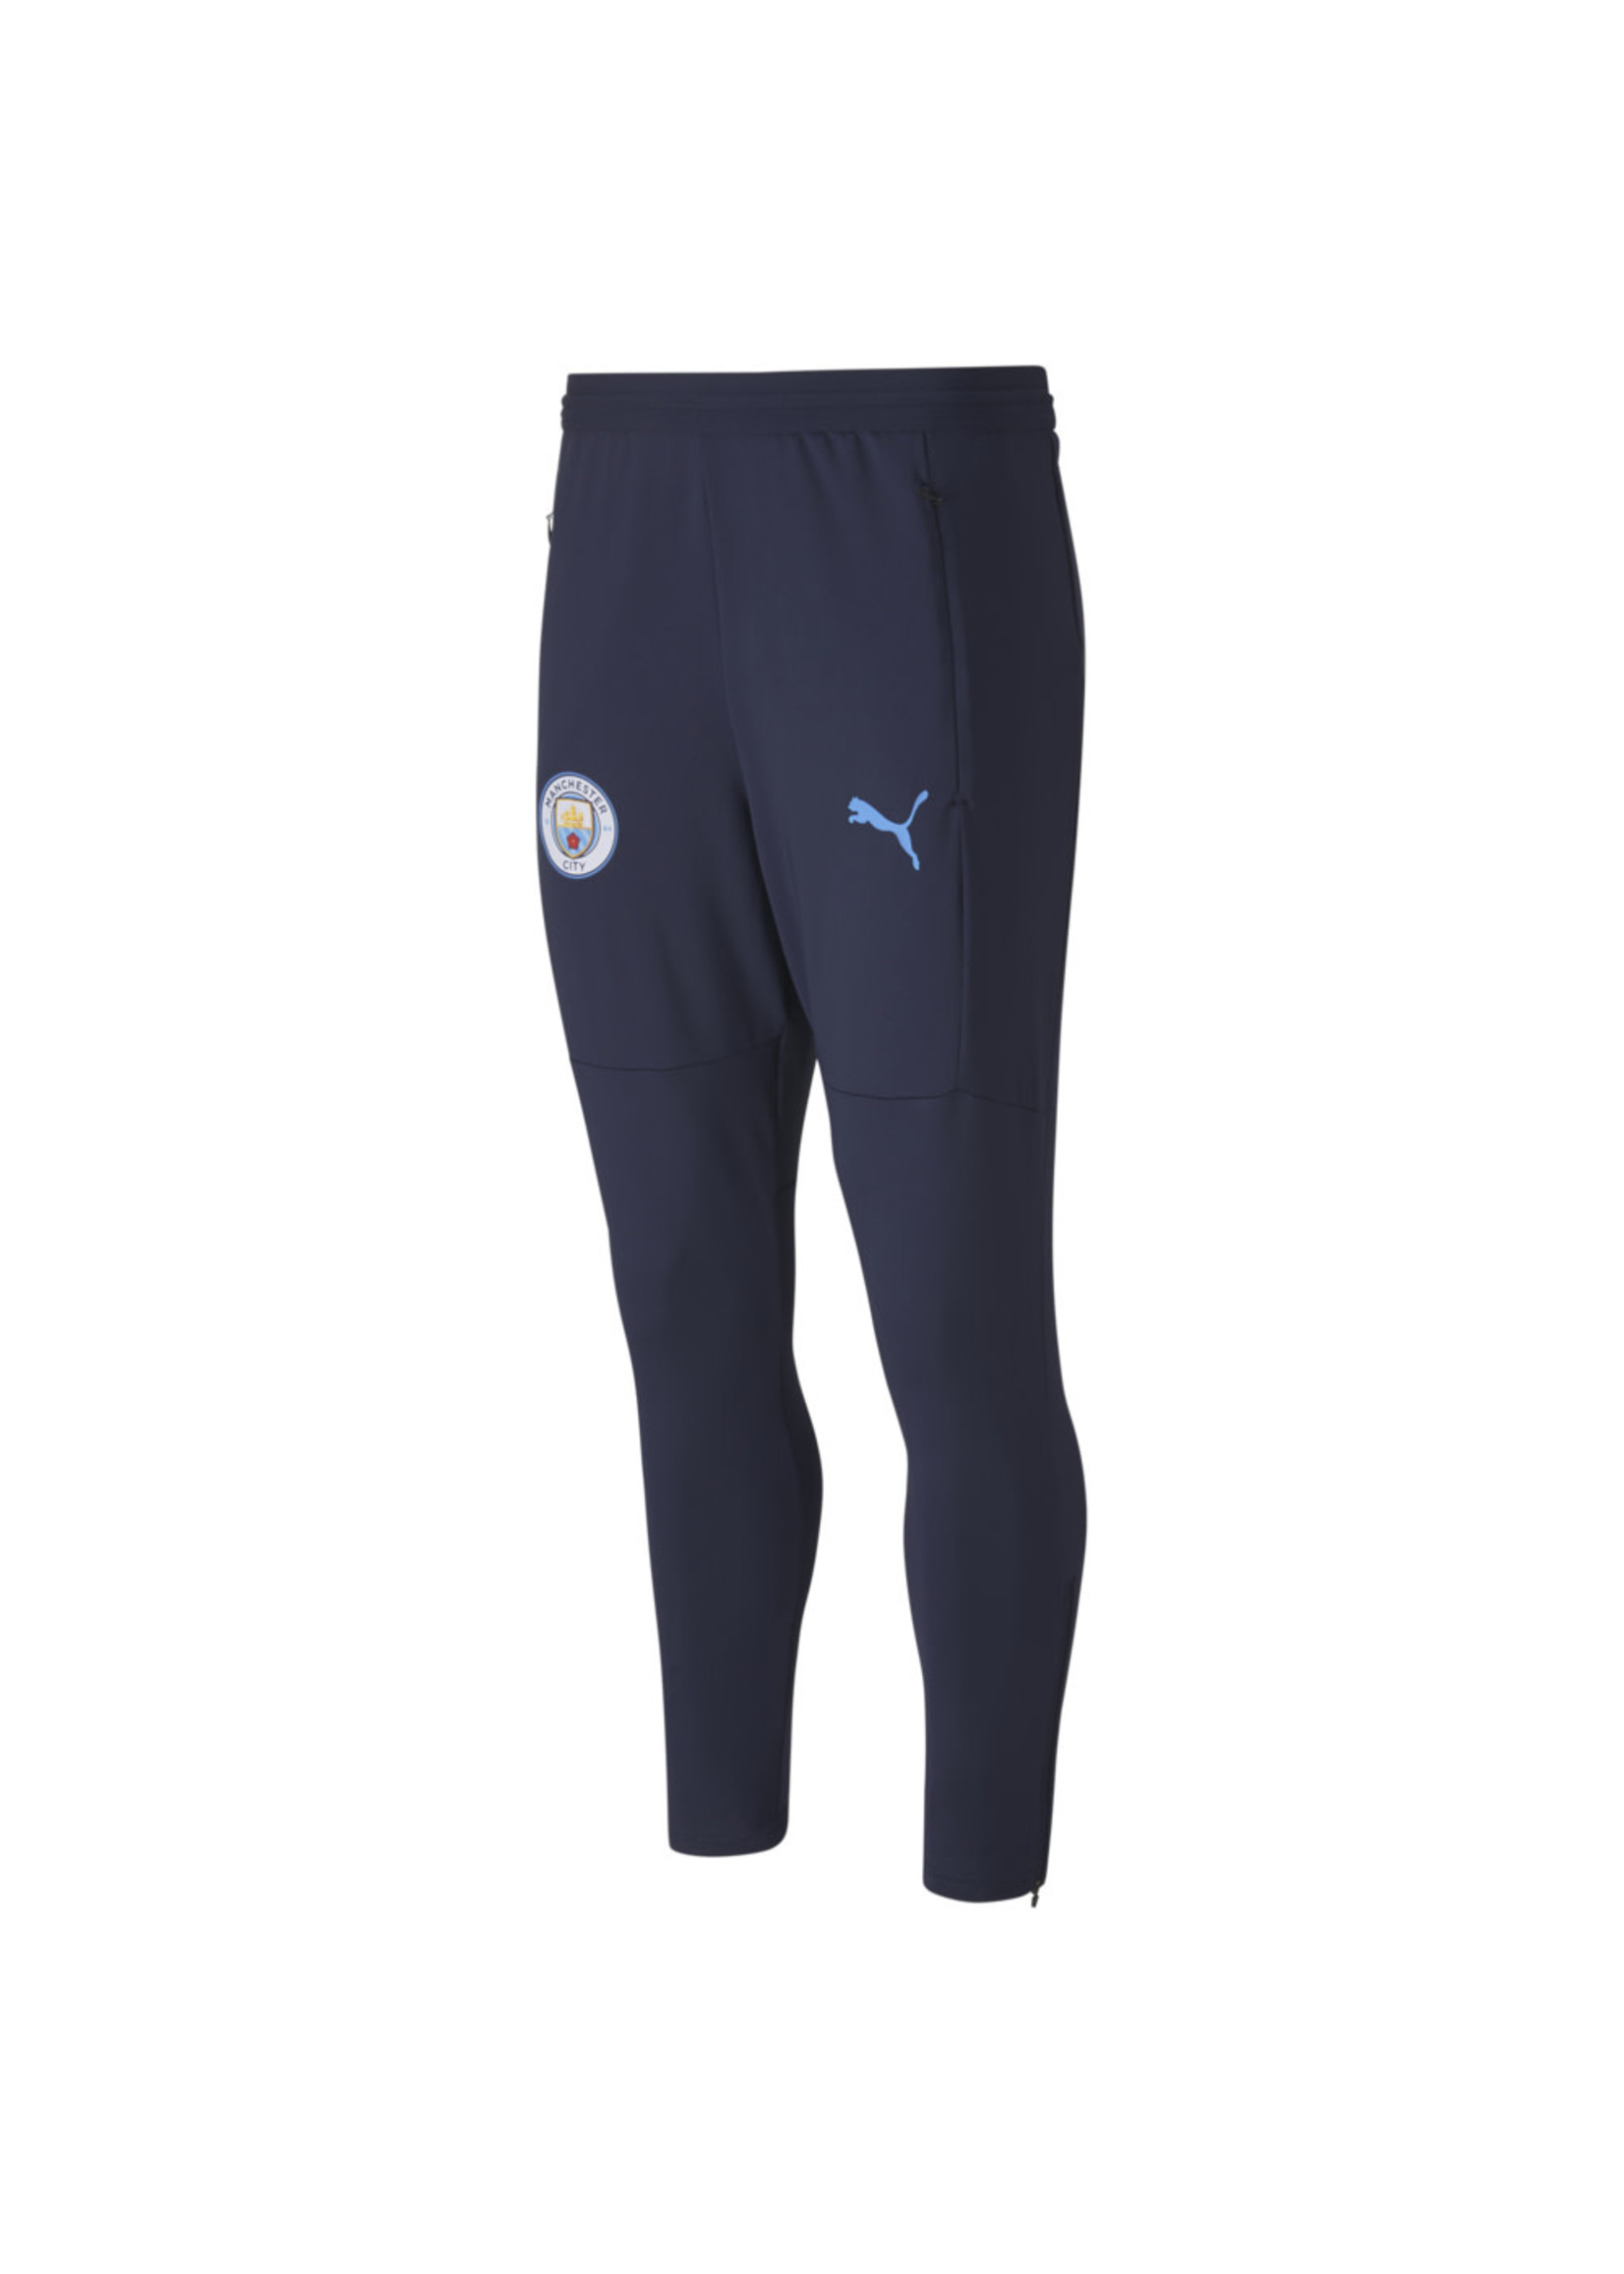 Puma Manchester City Training Pants